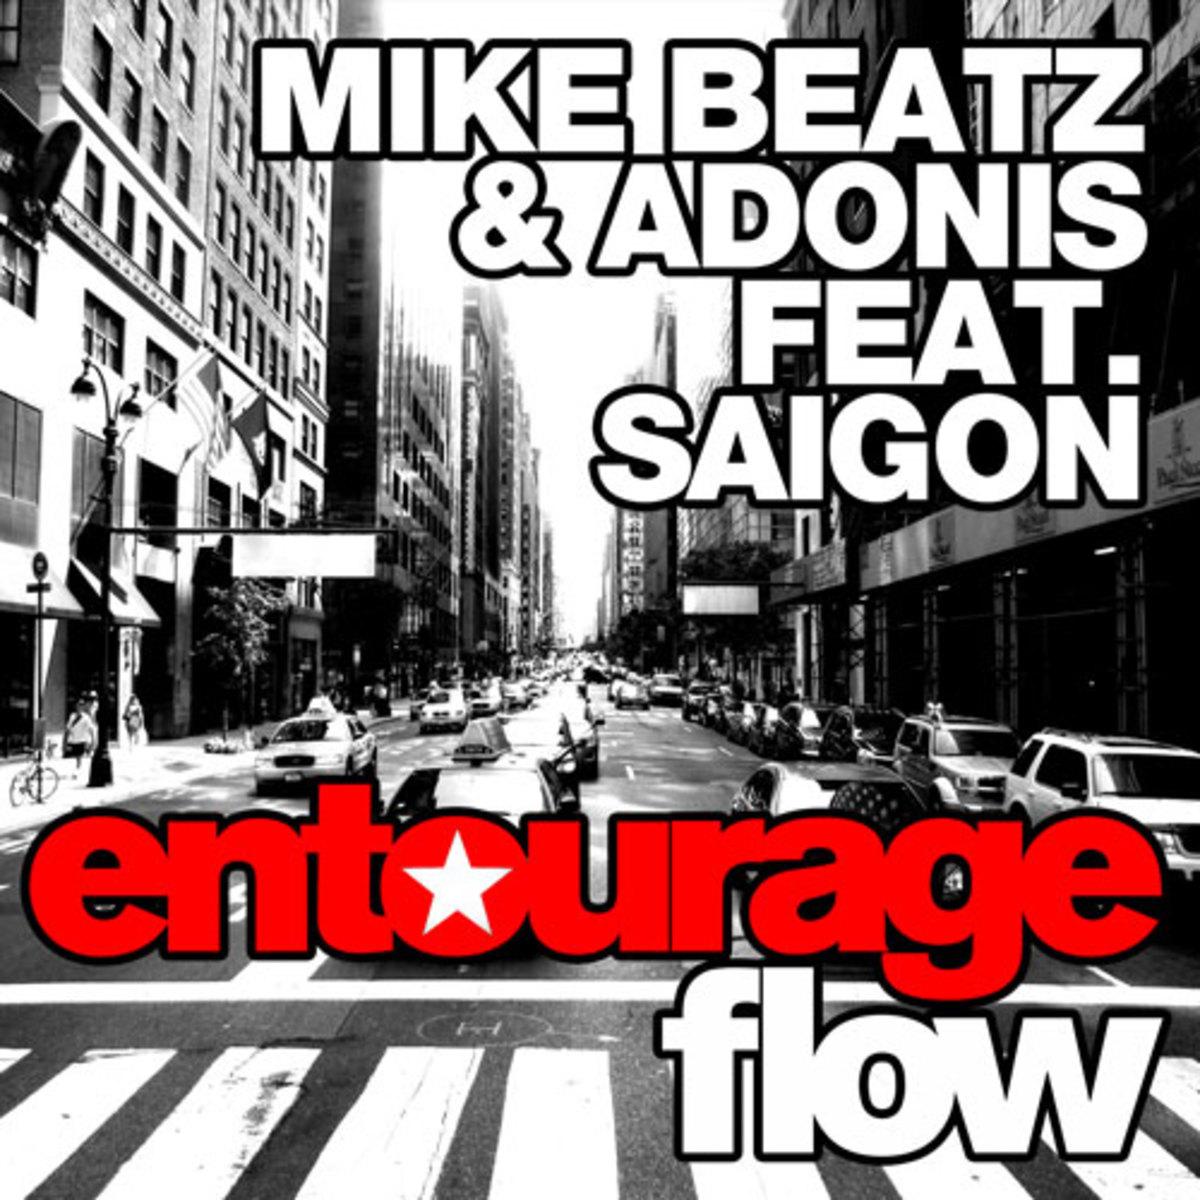 mikebeatz-entourageflow.jpg